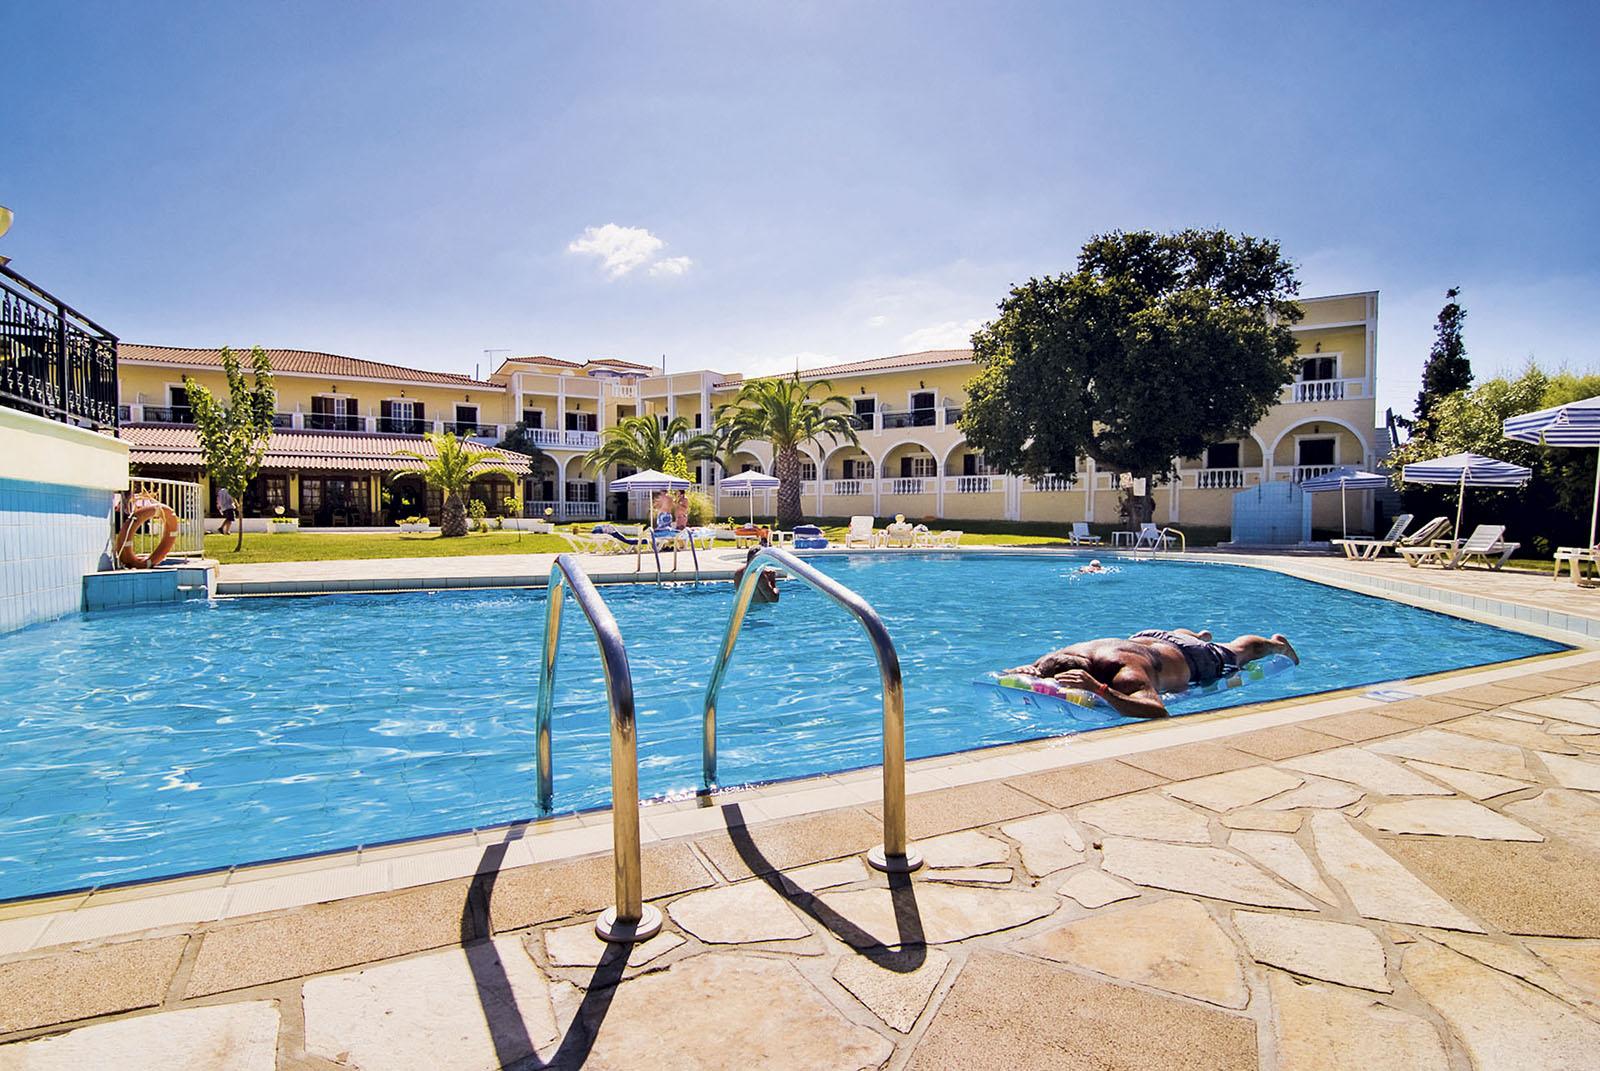 http://www.budavartours.hu/binaries//content/gallery/budavar/locations/accomodations/G%C3%B6r%C3%B6gorsz%C3%A1g/Argassi/Palmyra+Hotel/palmyra_hotel_argassi_medence.jpg